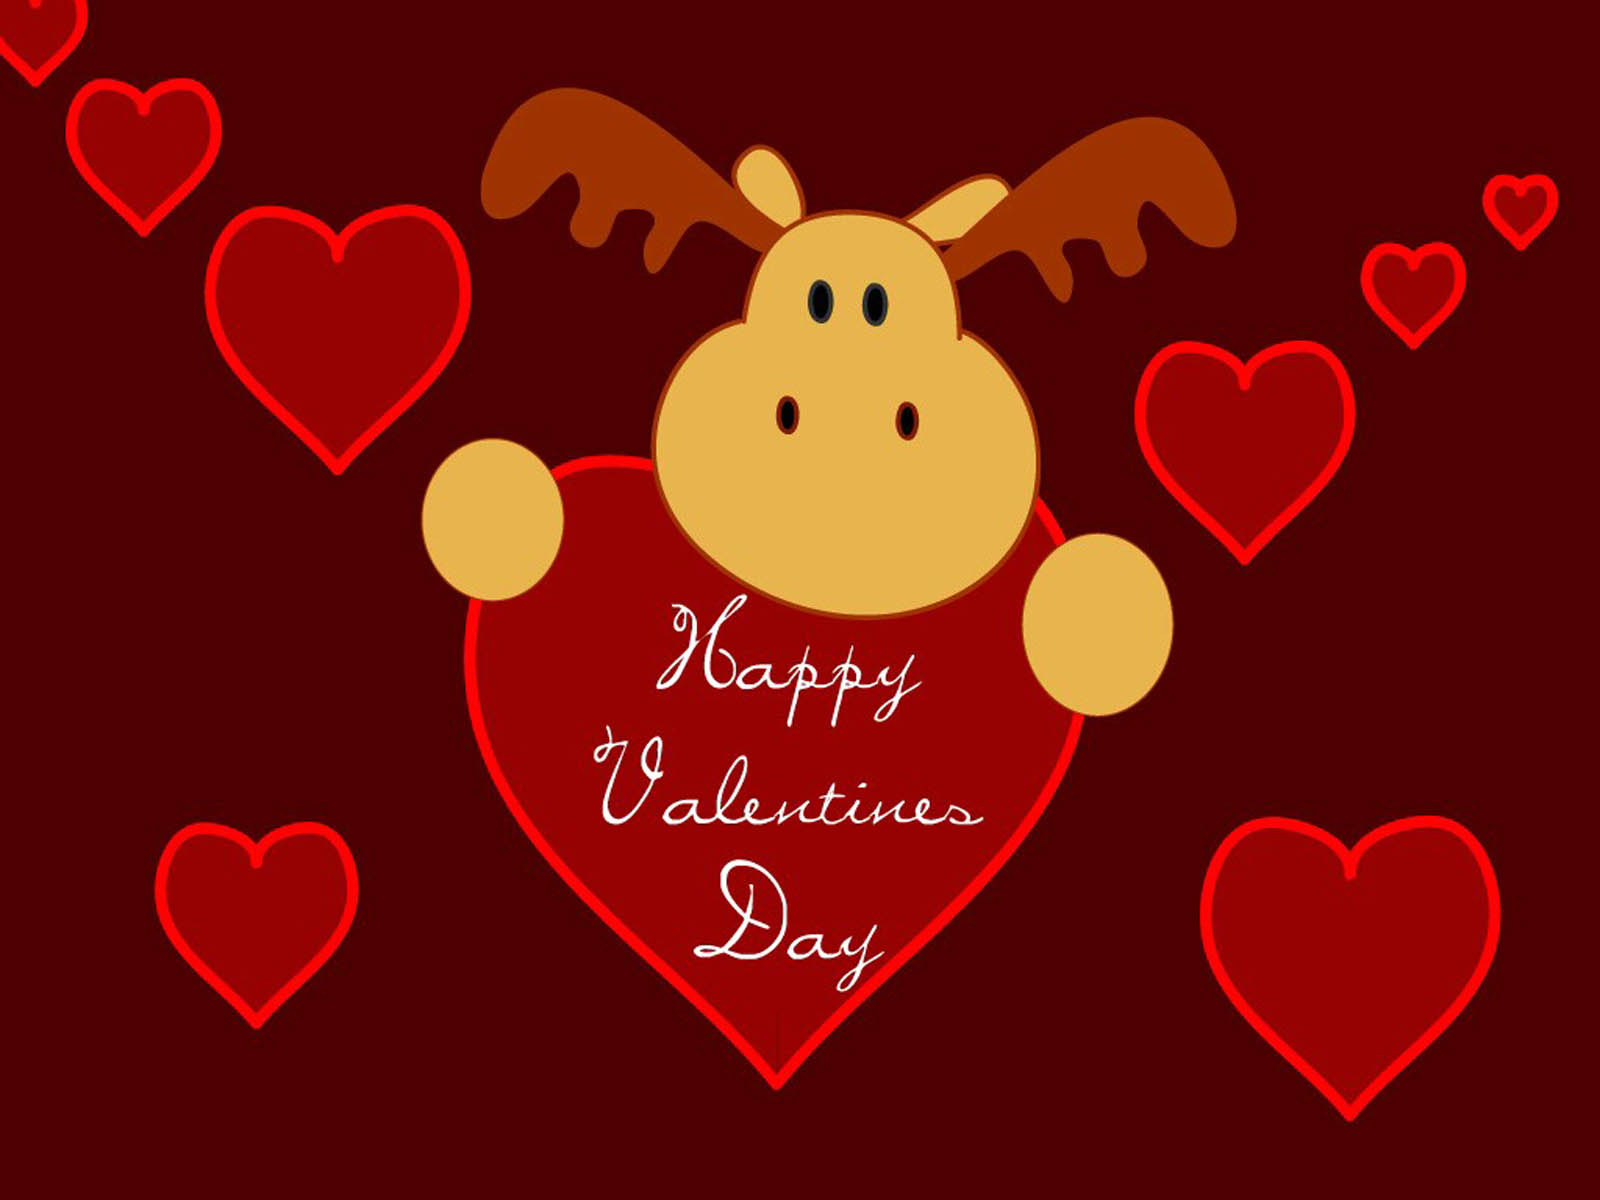 day desktop wallpapers valentines - photo #17